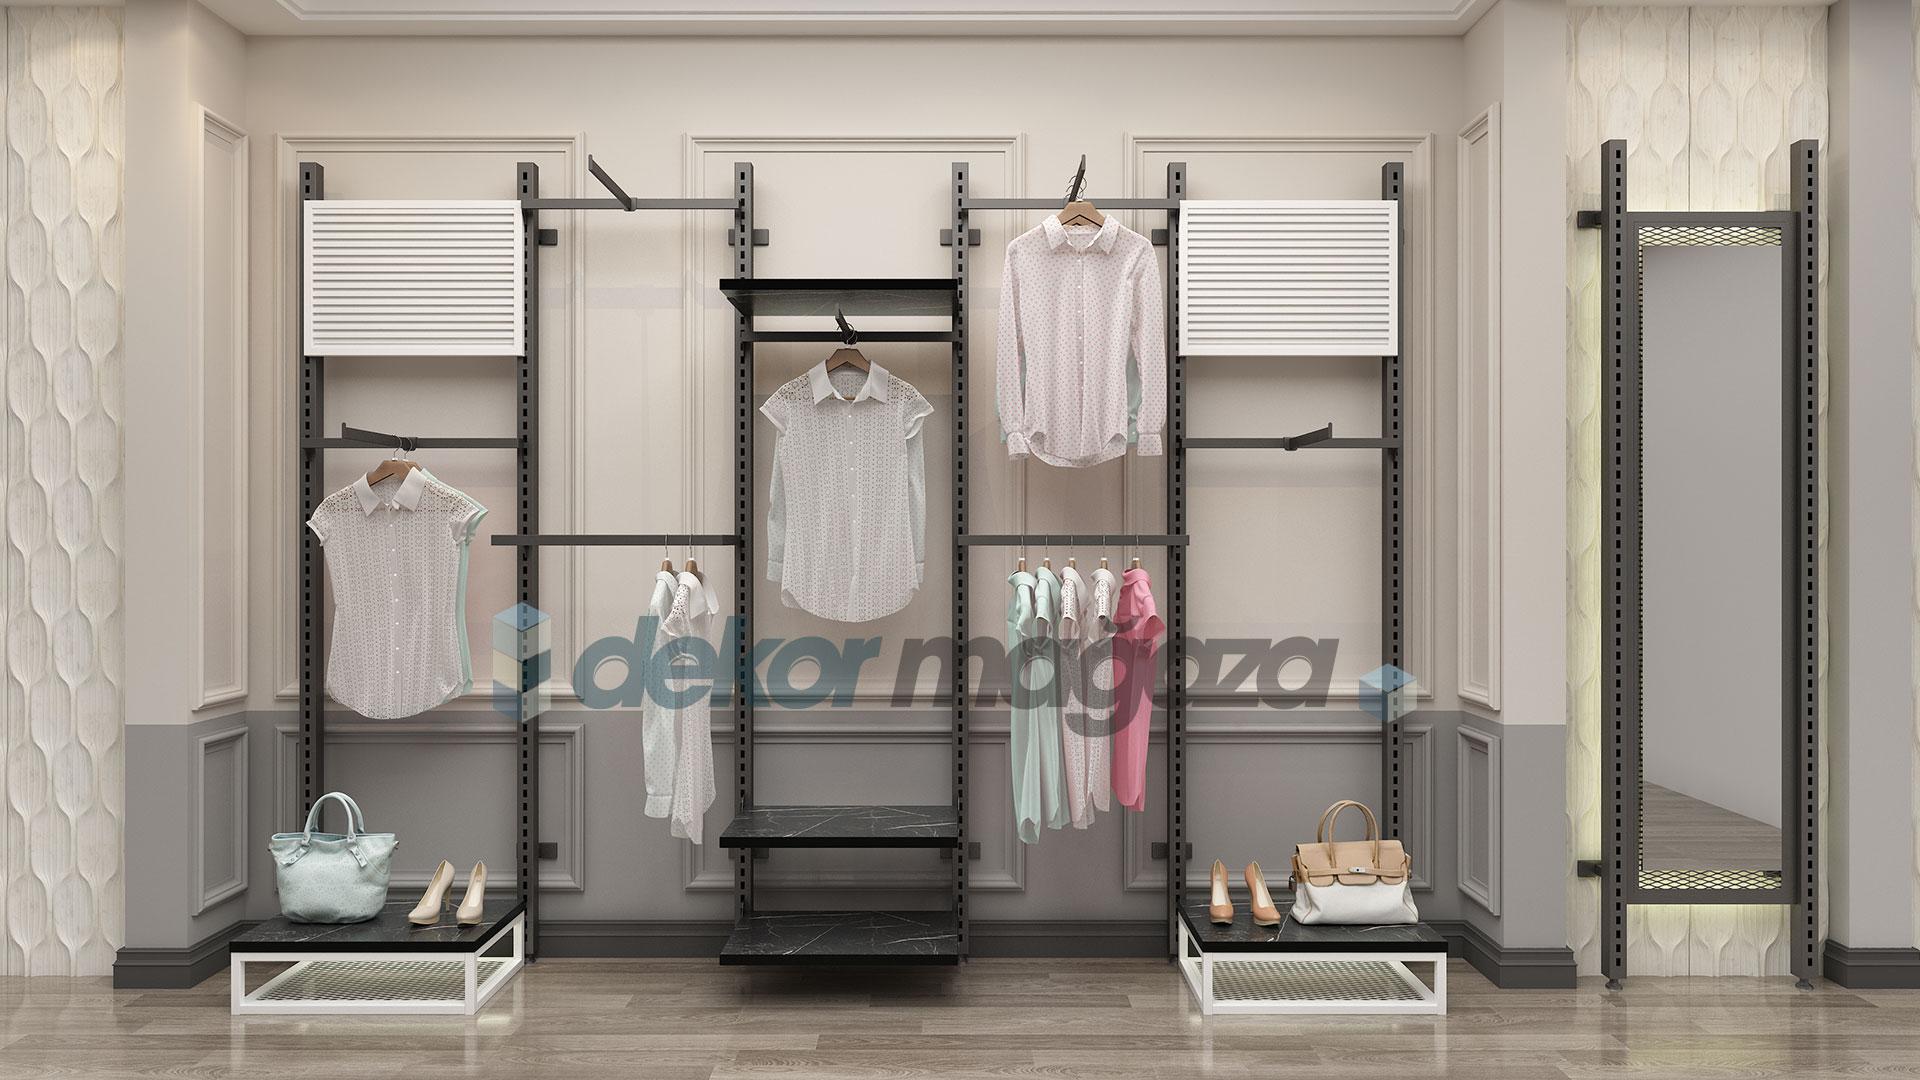 dekor-magaza-dekorasyon-magaza-raf-sistemleri-panos-032021-7-1